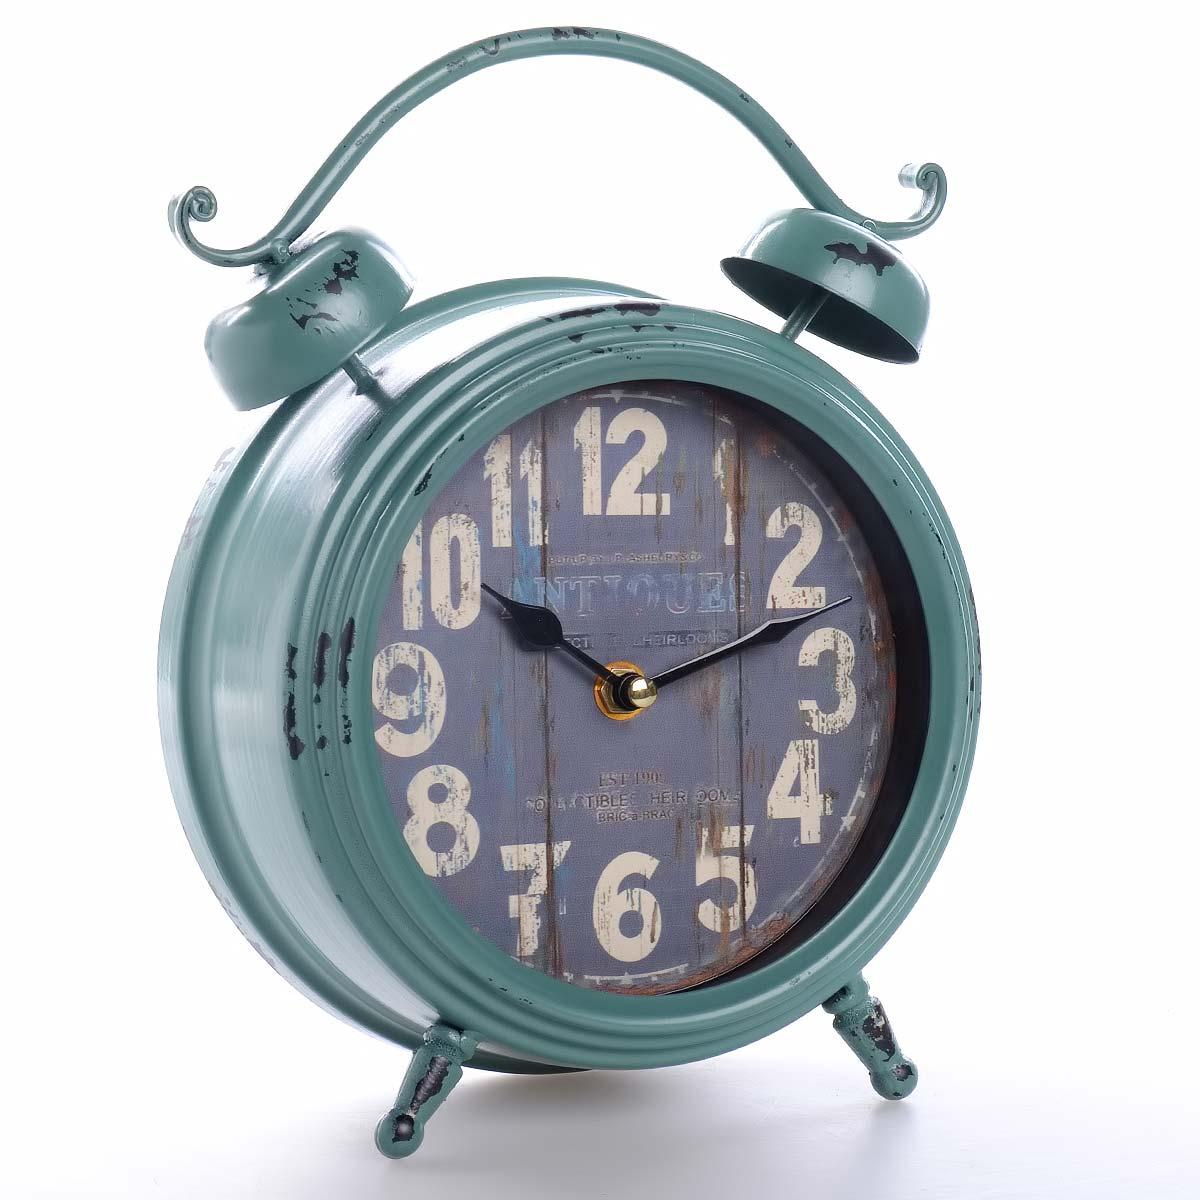 Vintage χειροποίητο διακοσμητικό ρολόι μεταλλικό - ΟΕΜ 51552